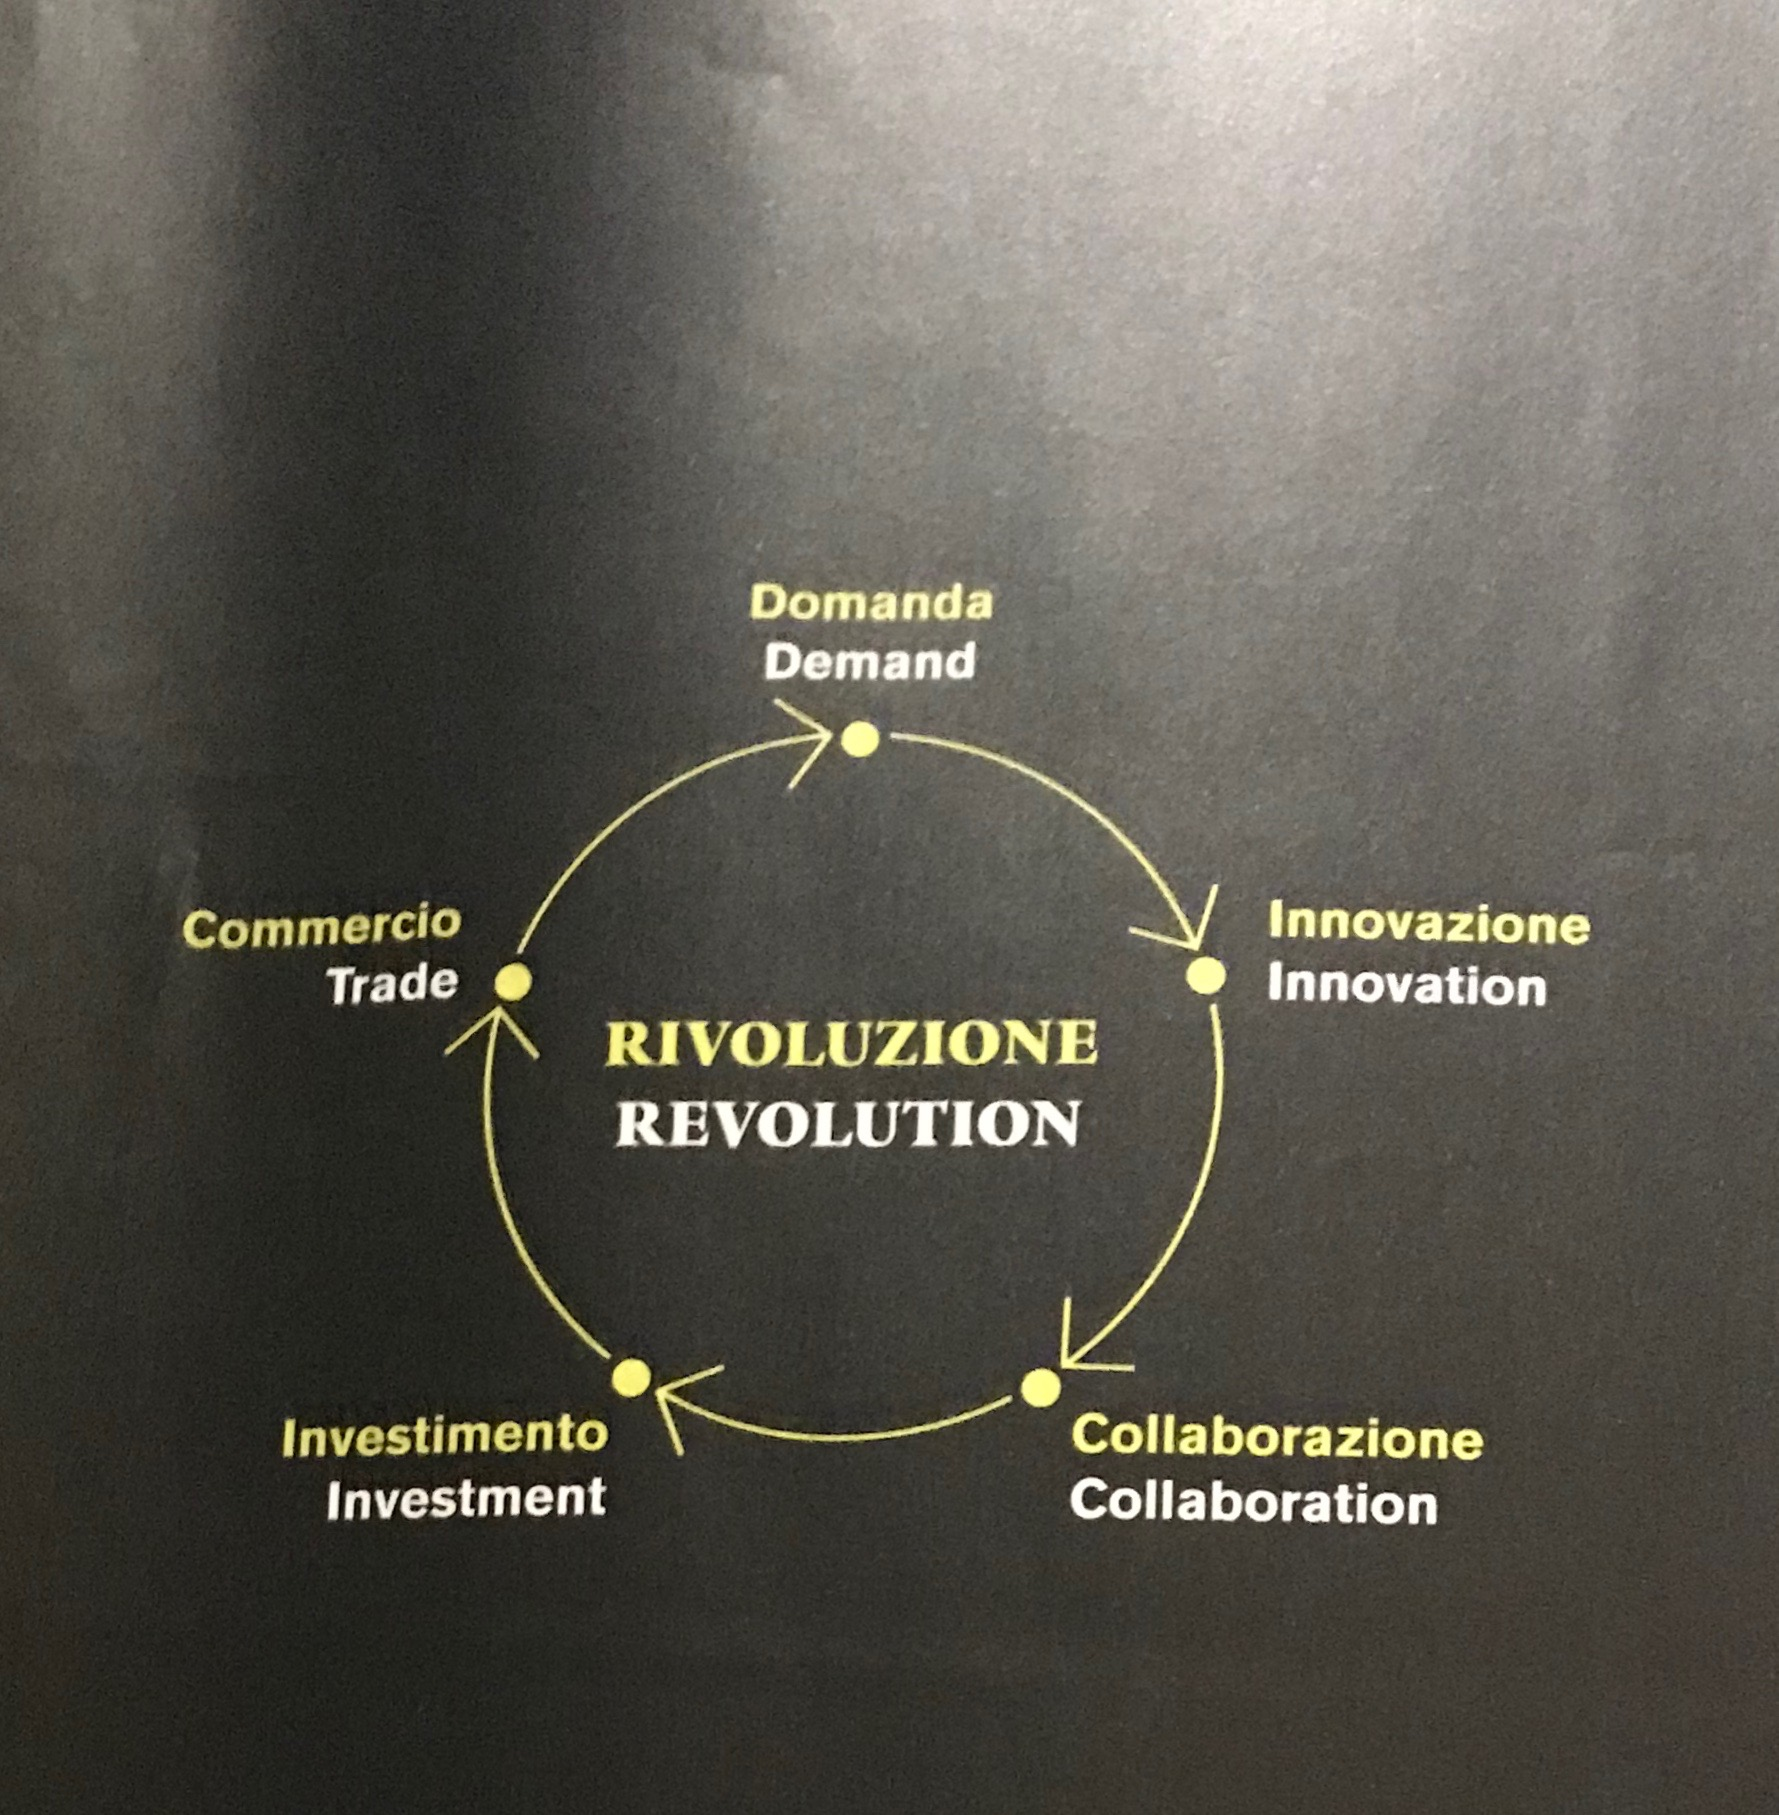 circle_of_innovation